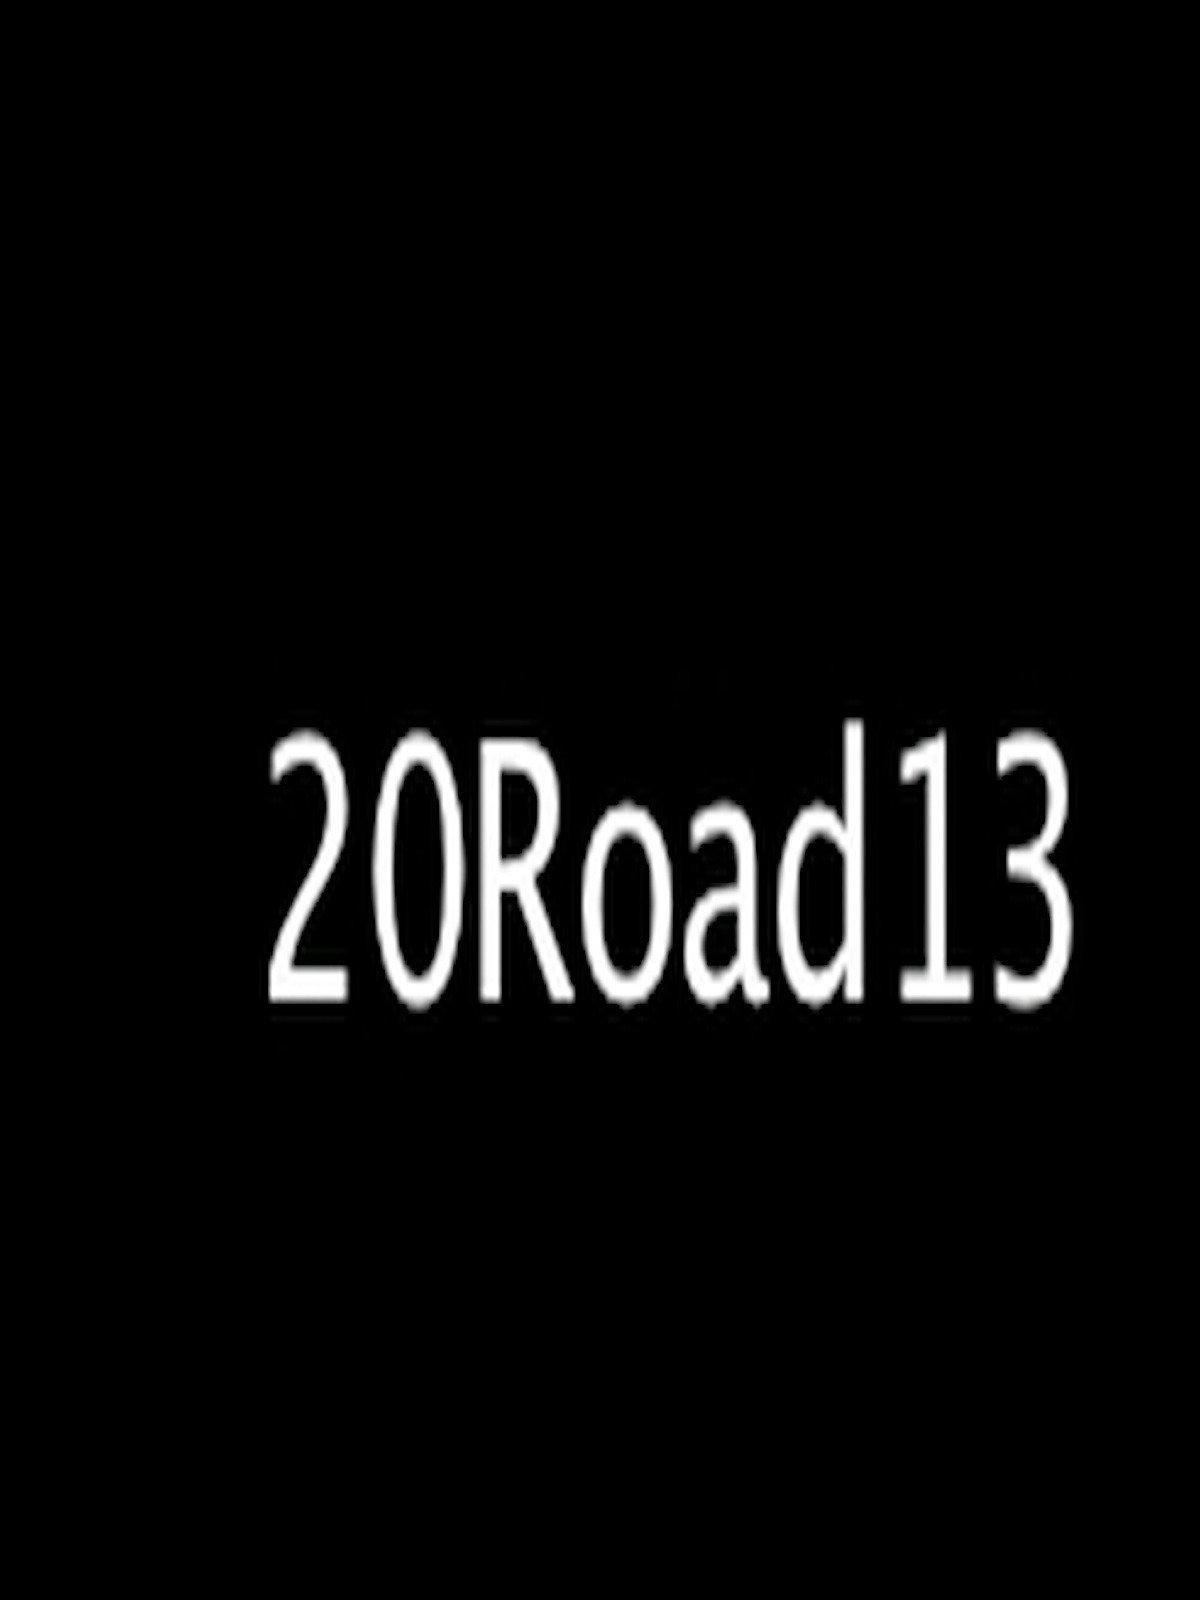 20Road13